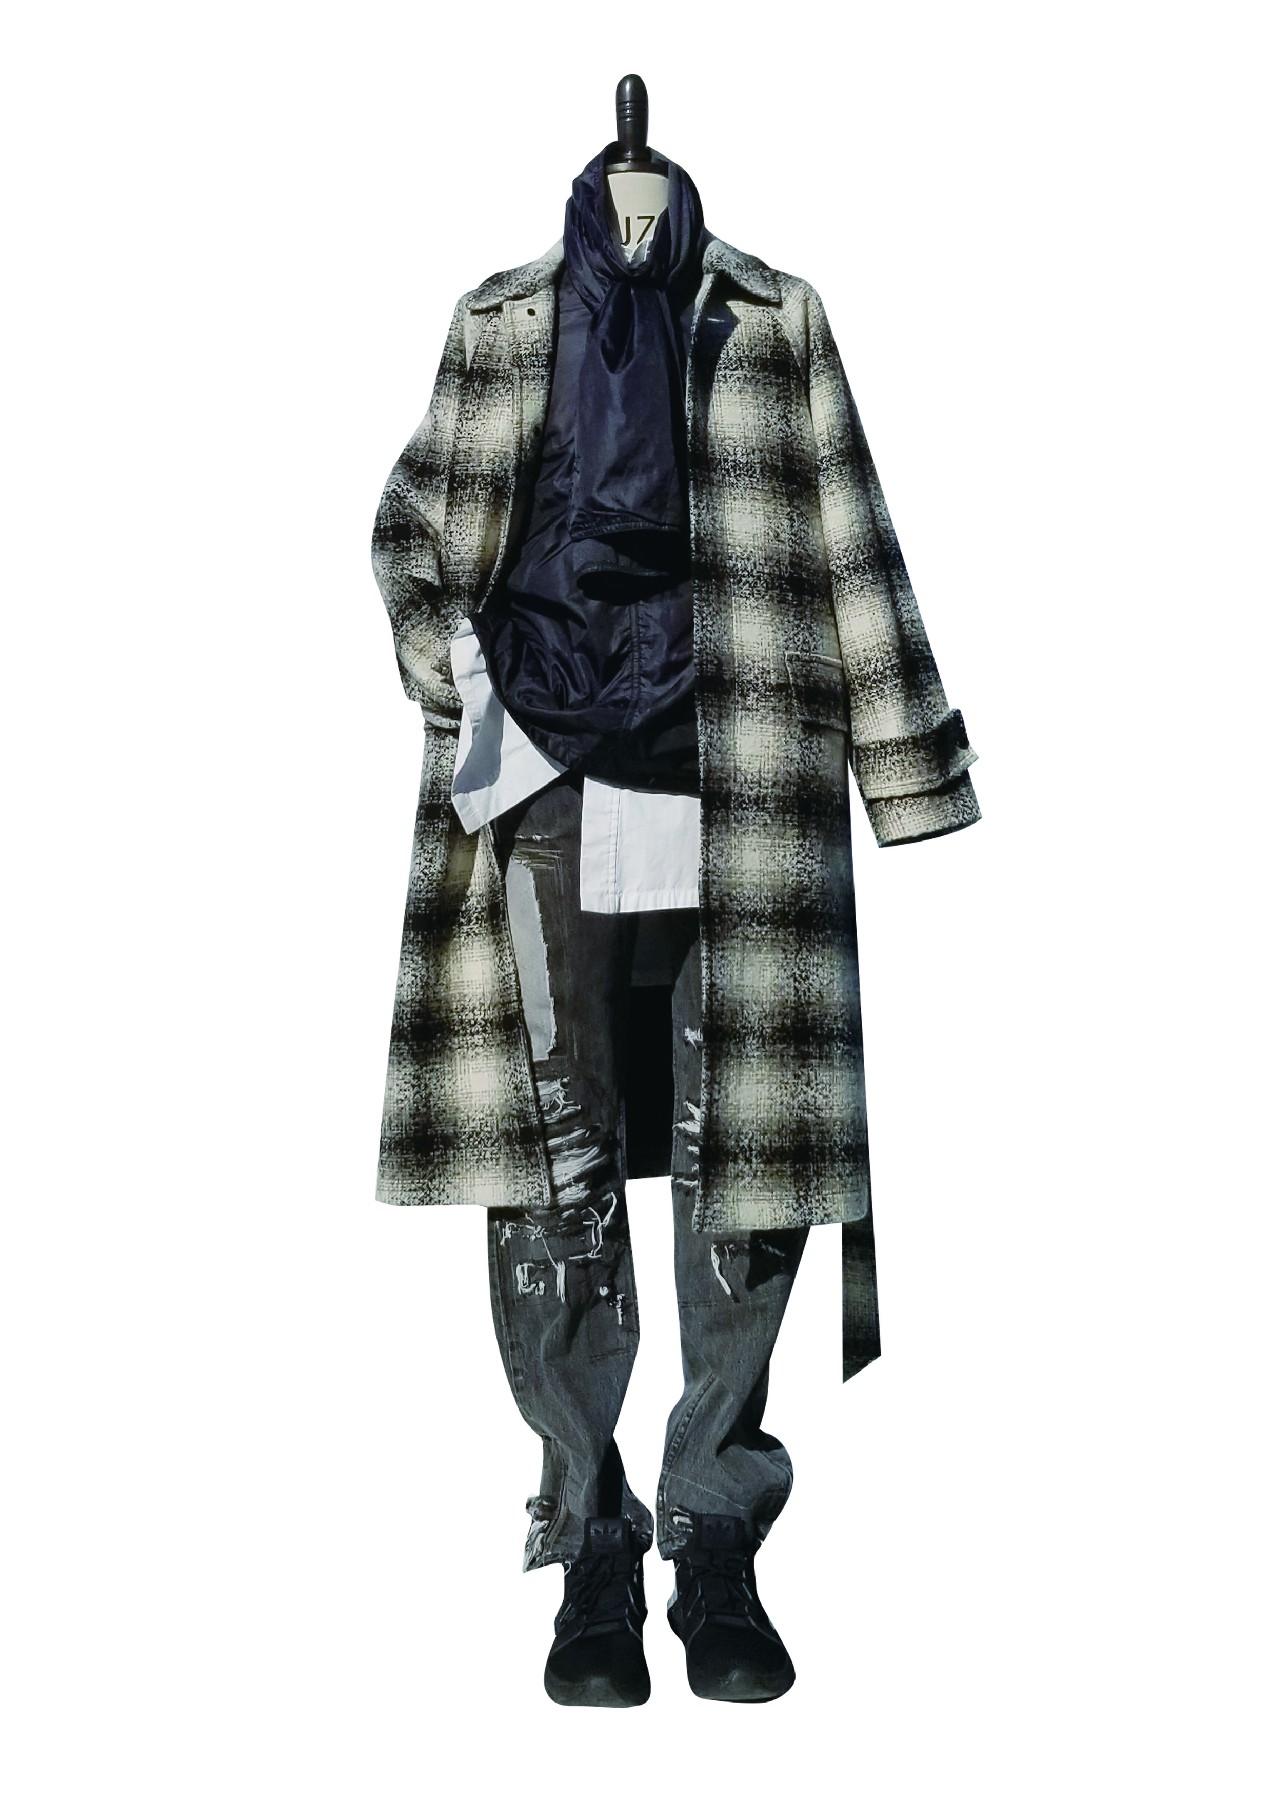 COPIHUE CLOTHING Array image17